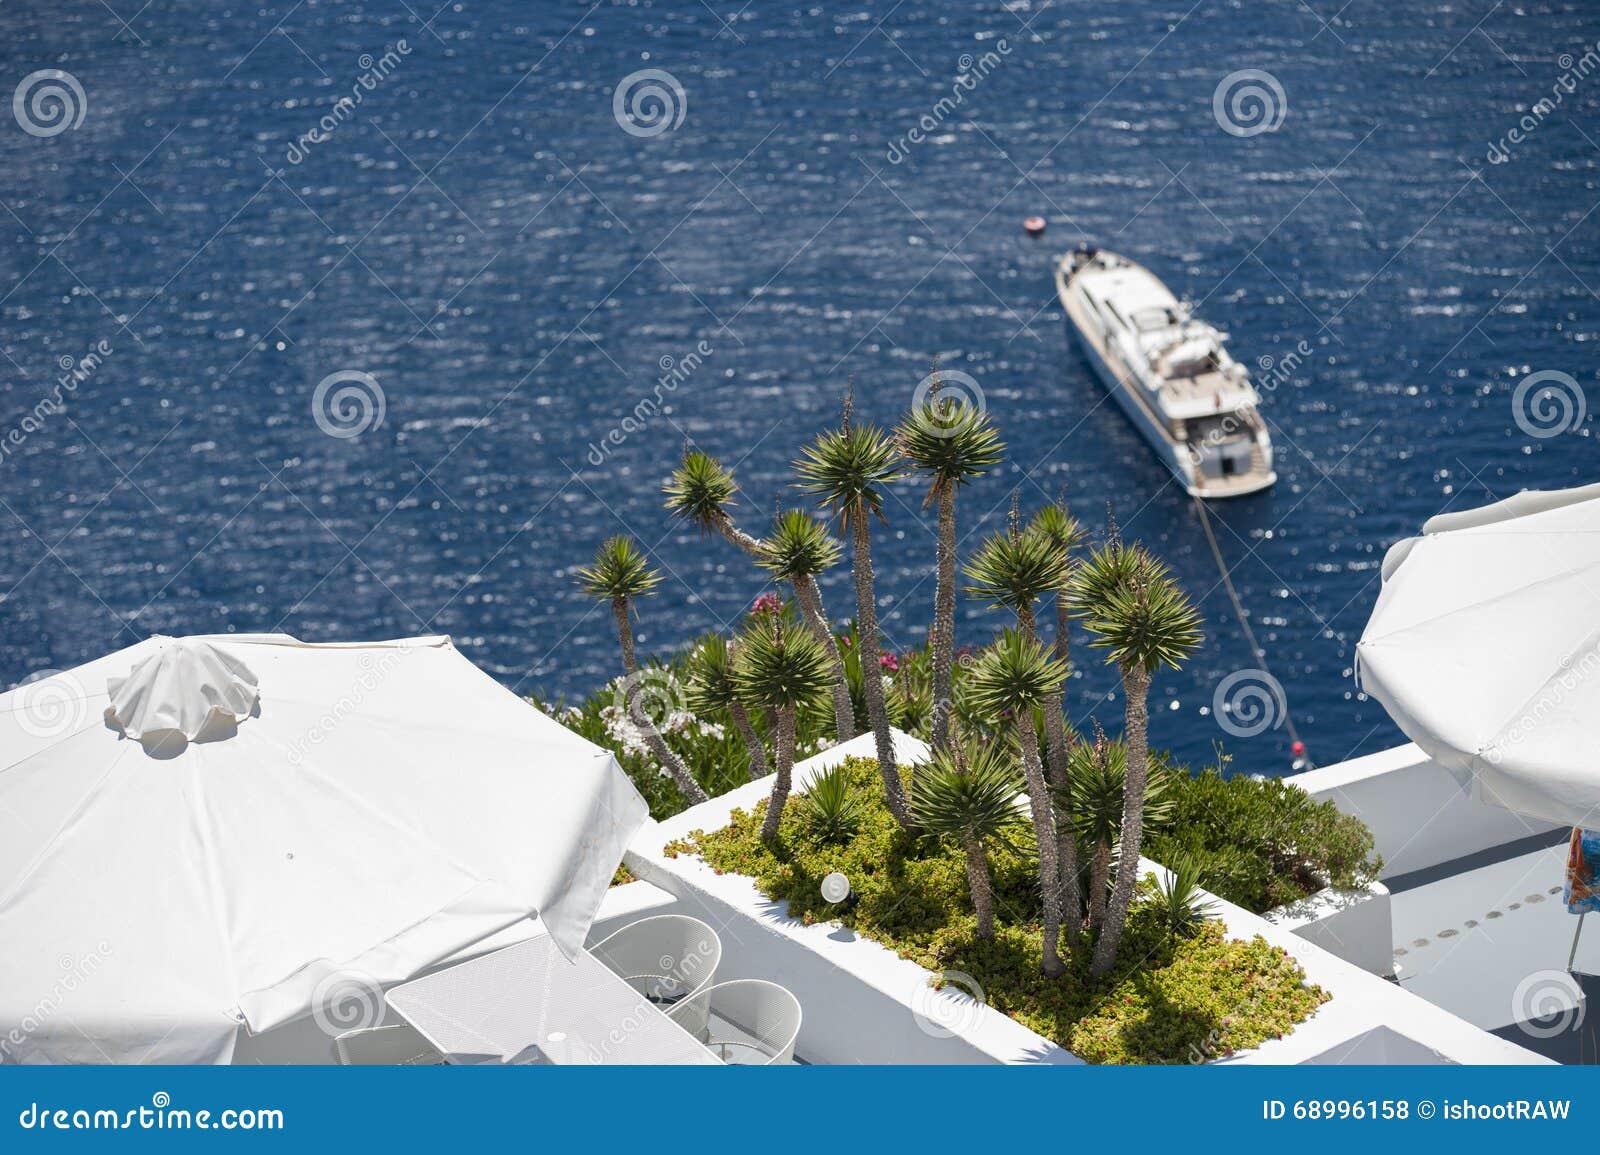 Series of Santorini Greece